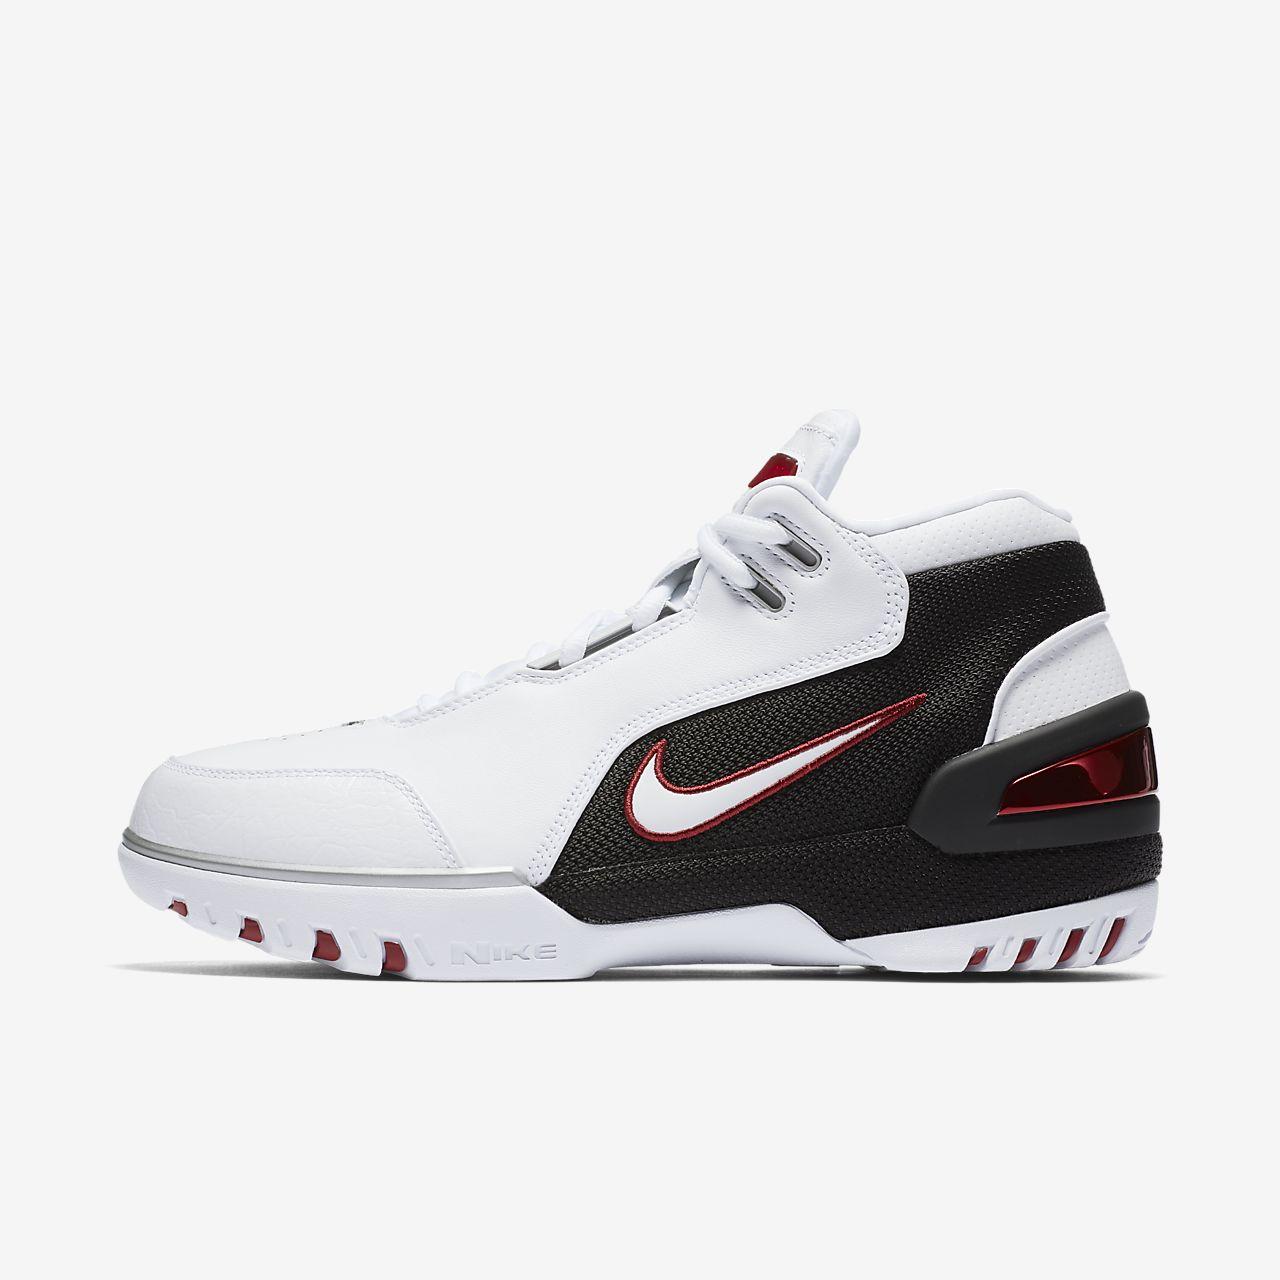 Zoom Scarpa Generation It Qs Uomo Air Basket Nike Da wW4qFWBTp